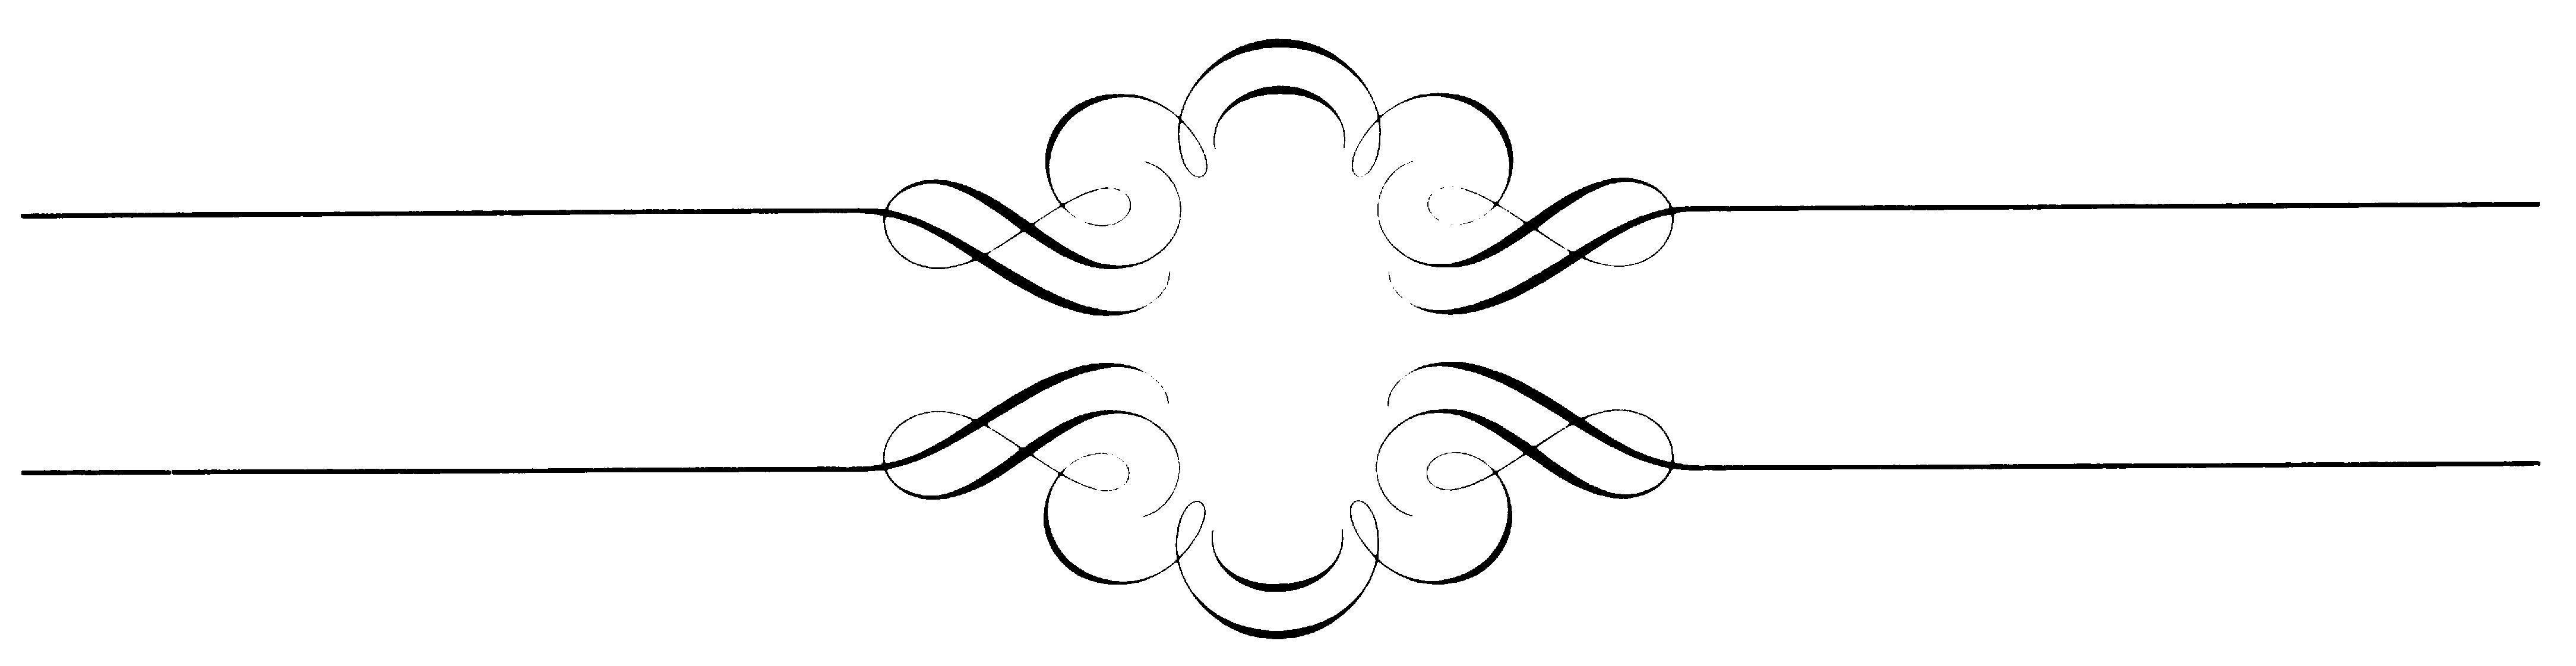 Line clipart elegant Elegant Zone Cliparts Caligraphy Cliparts